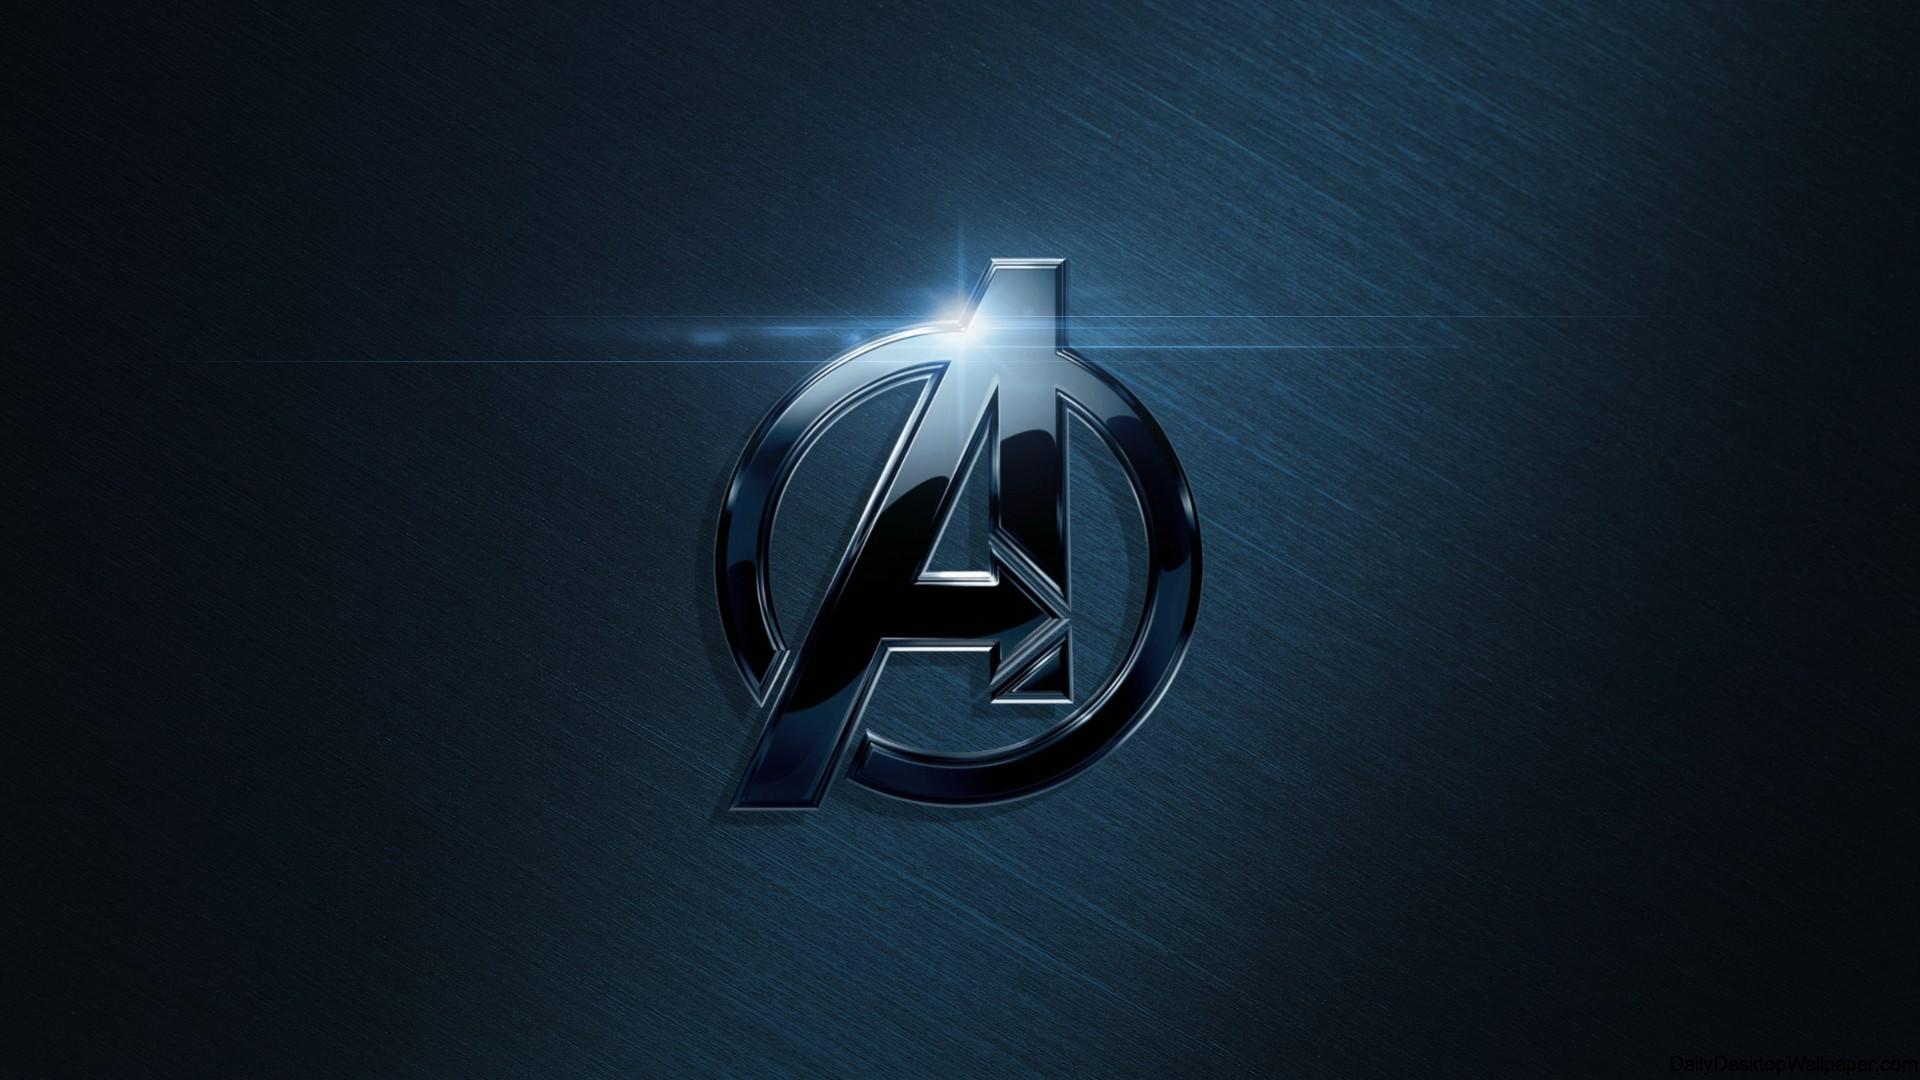 Avengers A  Hd Wallpapers